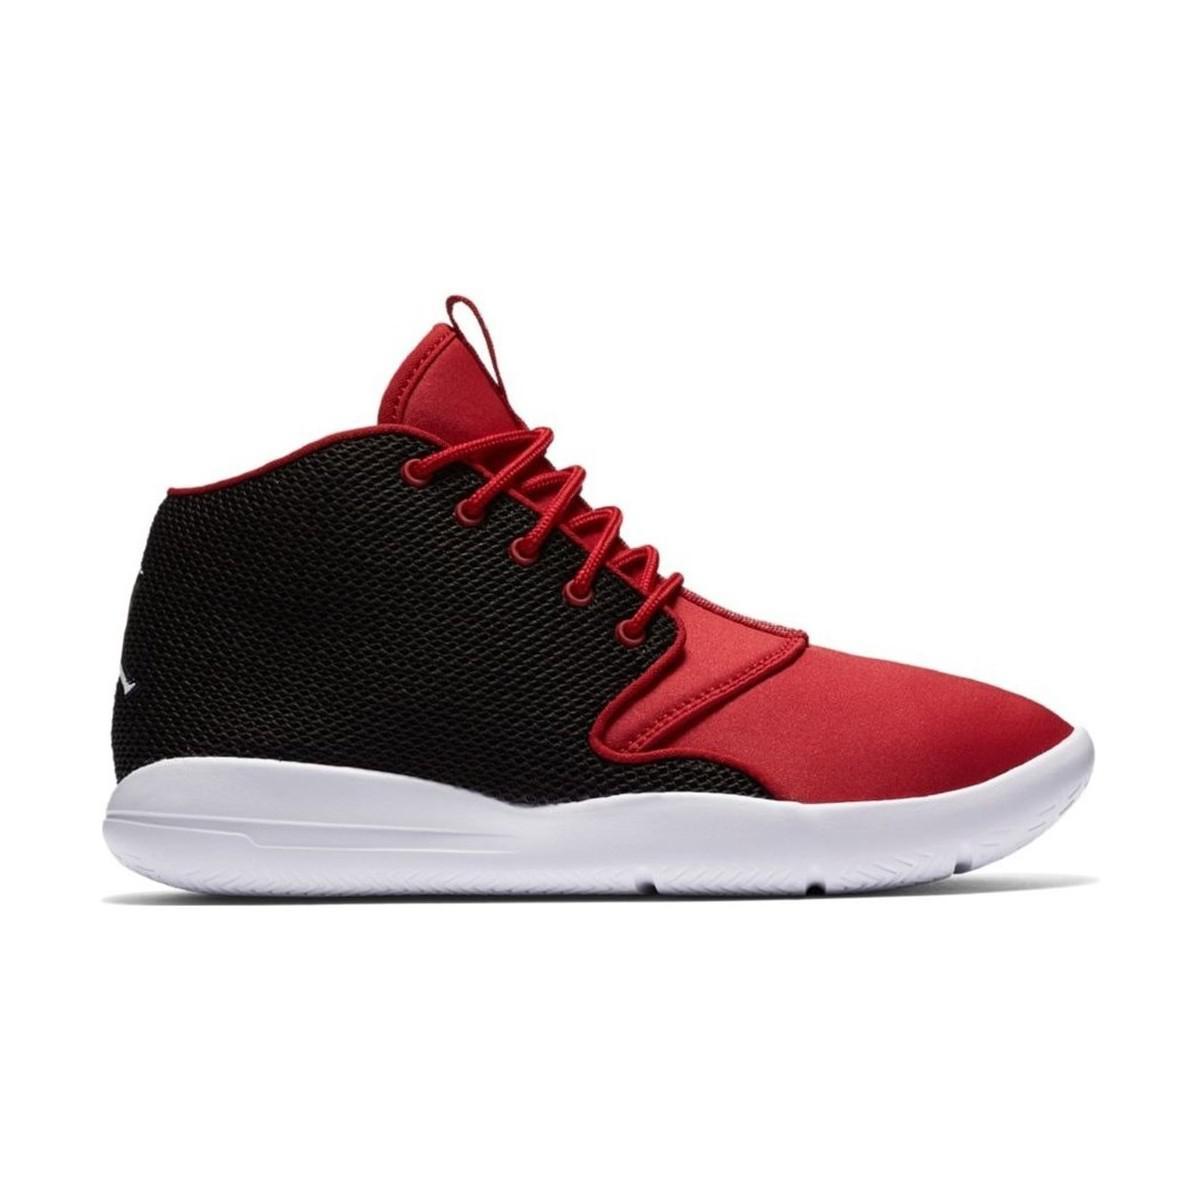 a9f46f0846b Nike Air Jordan Eclipse Chukka Bg Women s Shoes (high-top Trainers ...